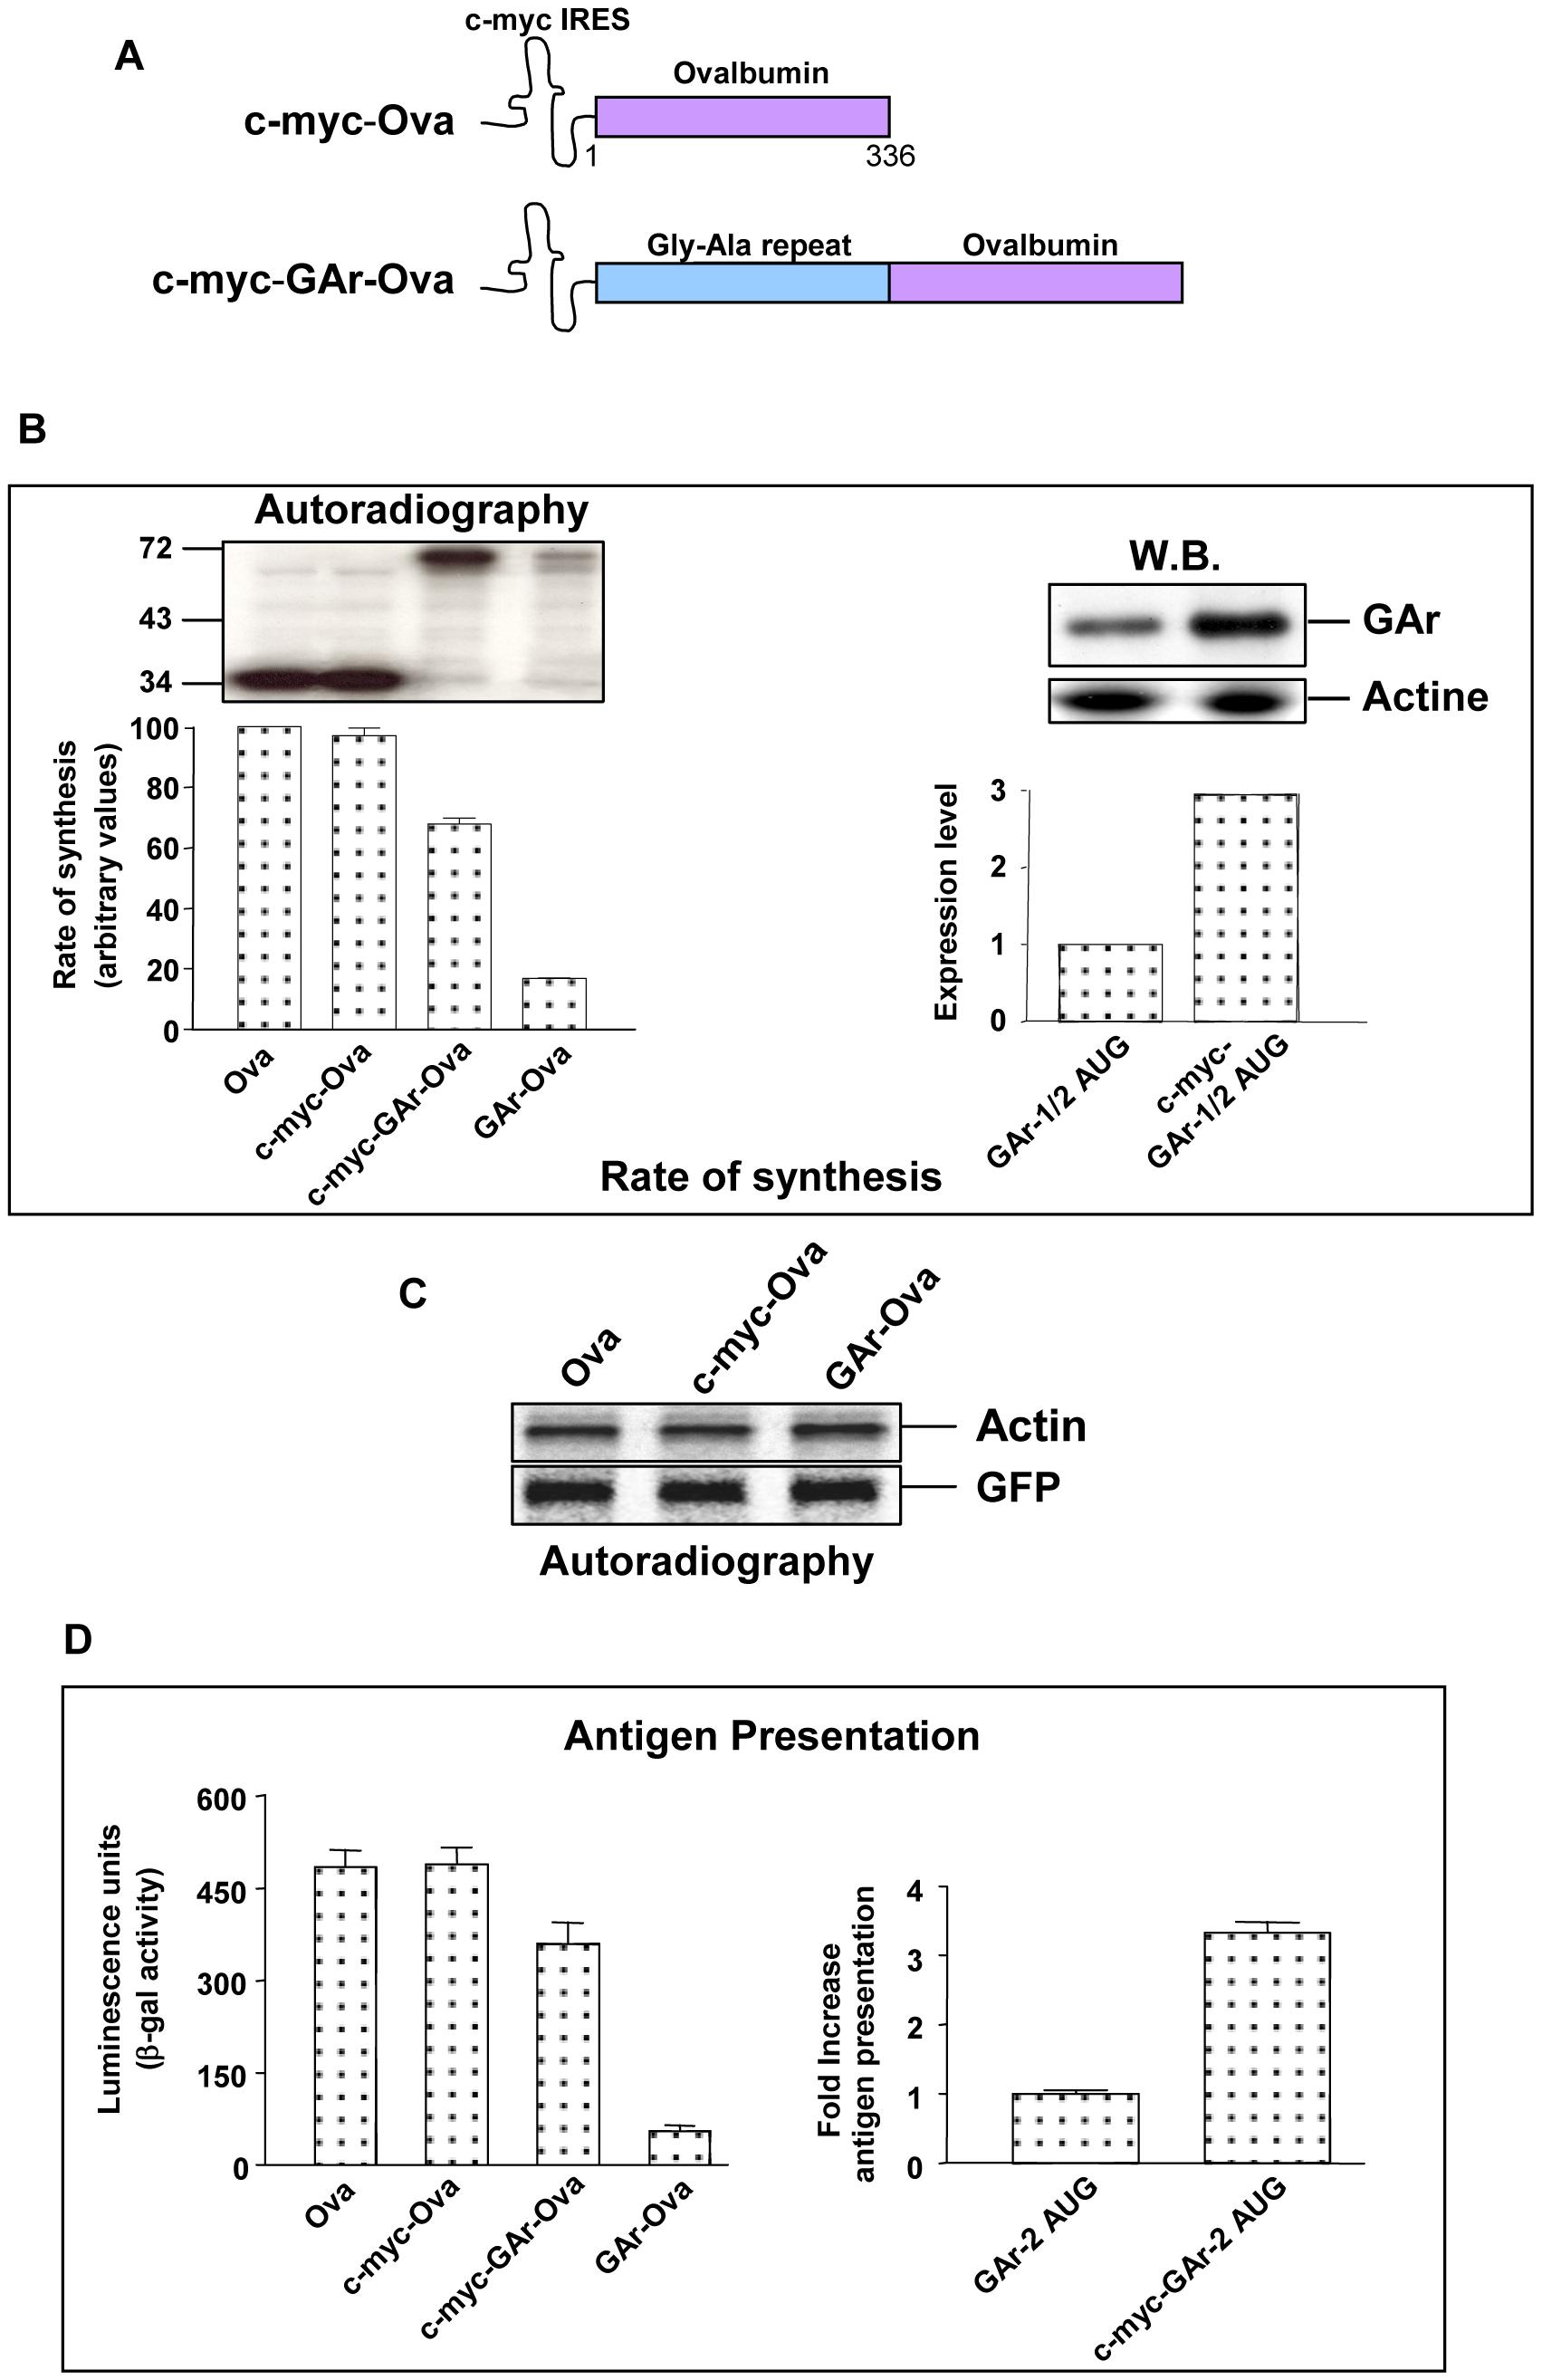 GAr suppresses antigen presentation by targeting the mRNA translation initiation process.